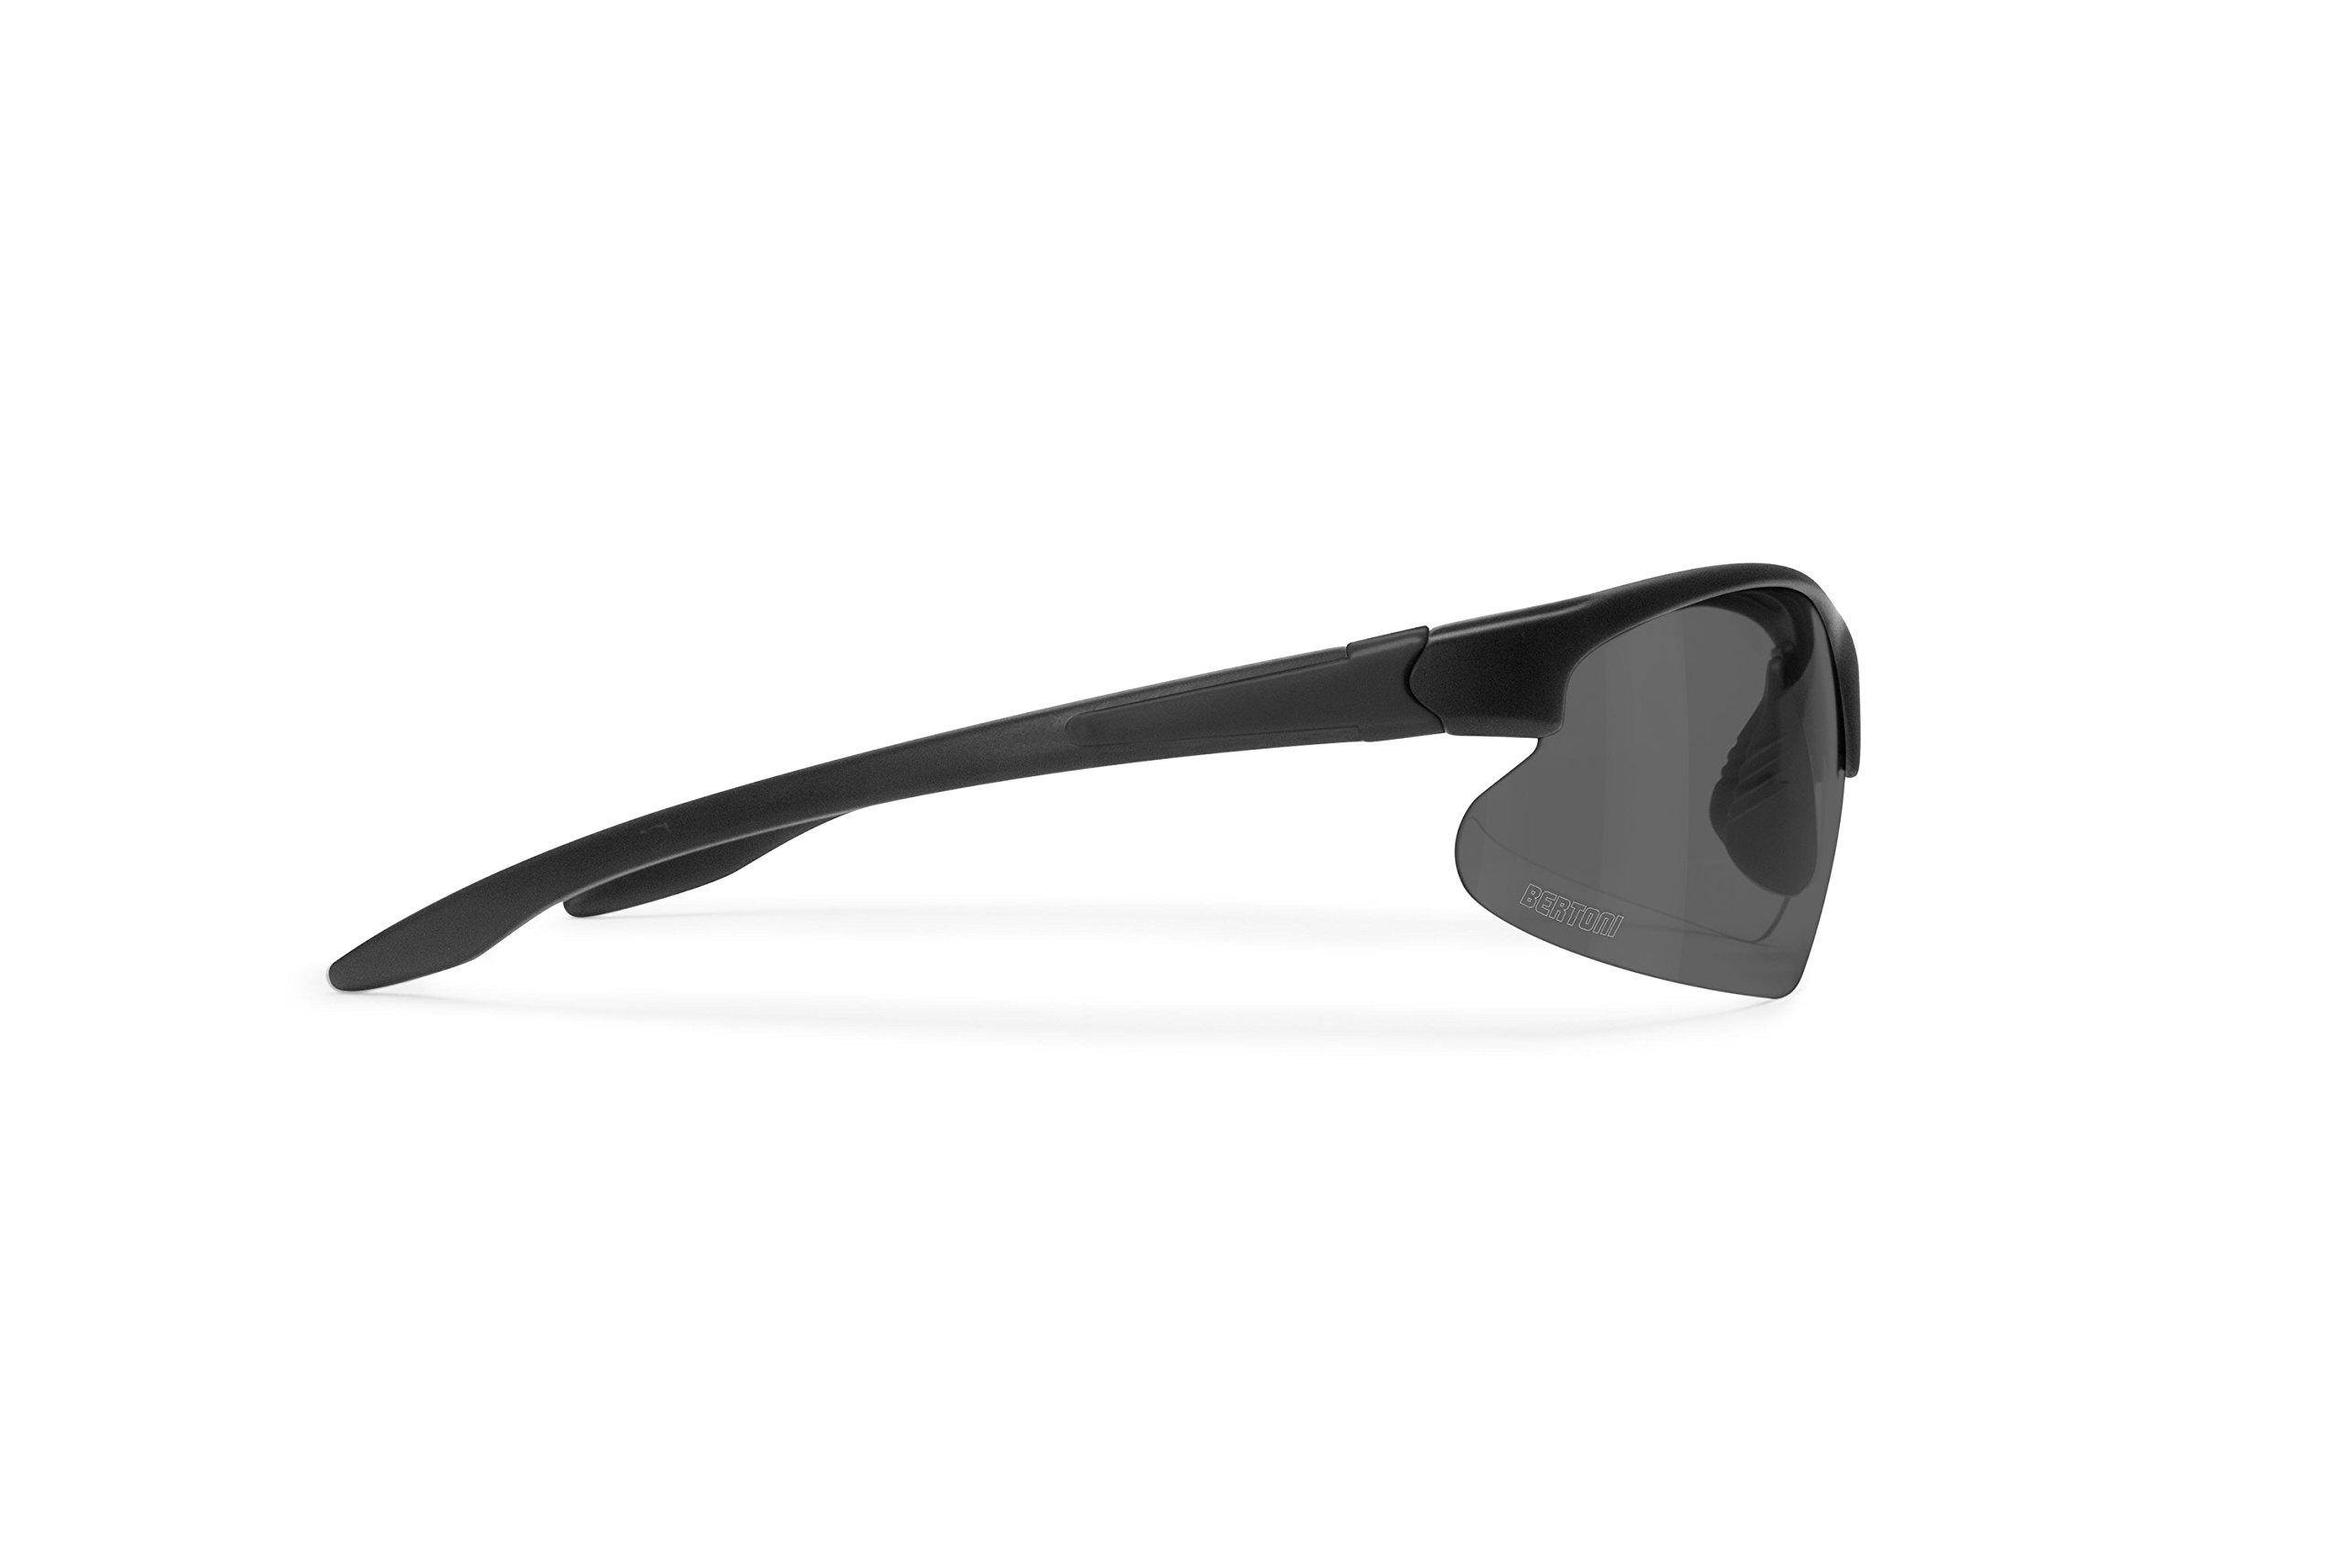 Bertoni Polarized Photochromic Sunglasses for Cycling Running Golf Ski - P301AFT Italy Bike Wraparound Windproof Sunglasses - Shiny Black/Rubber Black - Photochromic Polarized